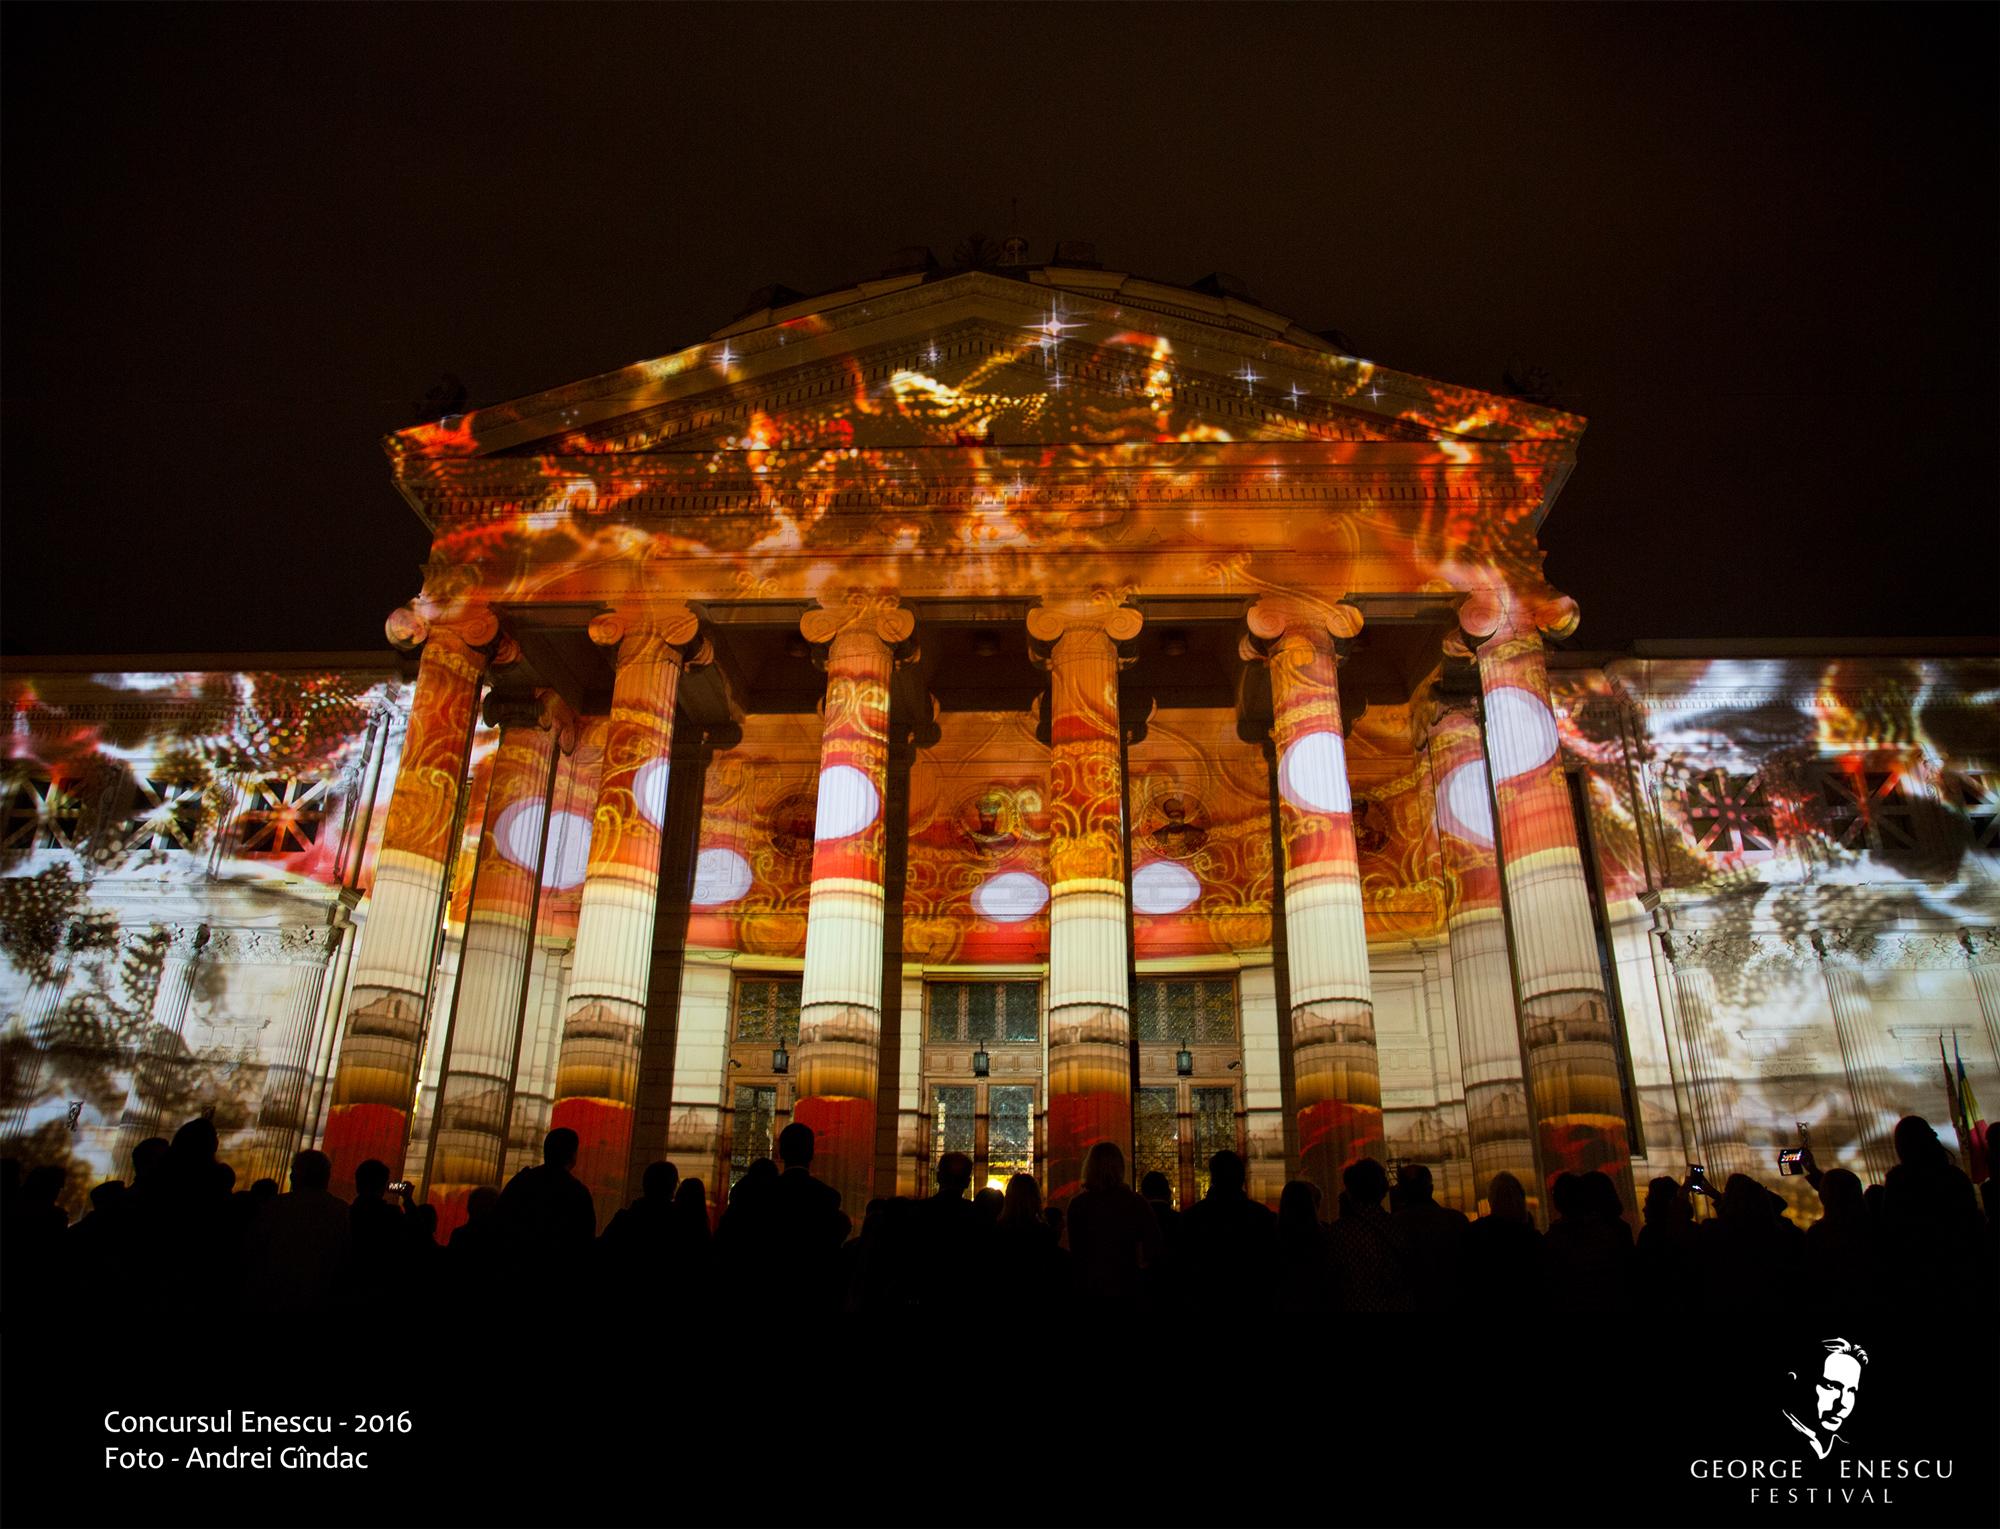 concurs_enescu_25oct_proiectie_foto-Andrei_gindac35